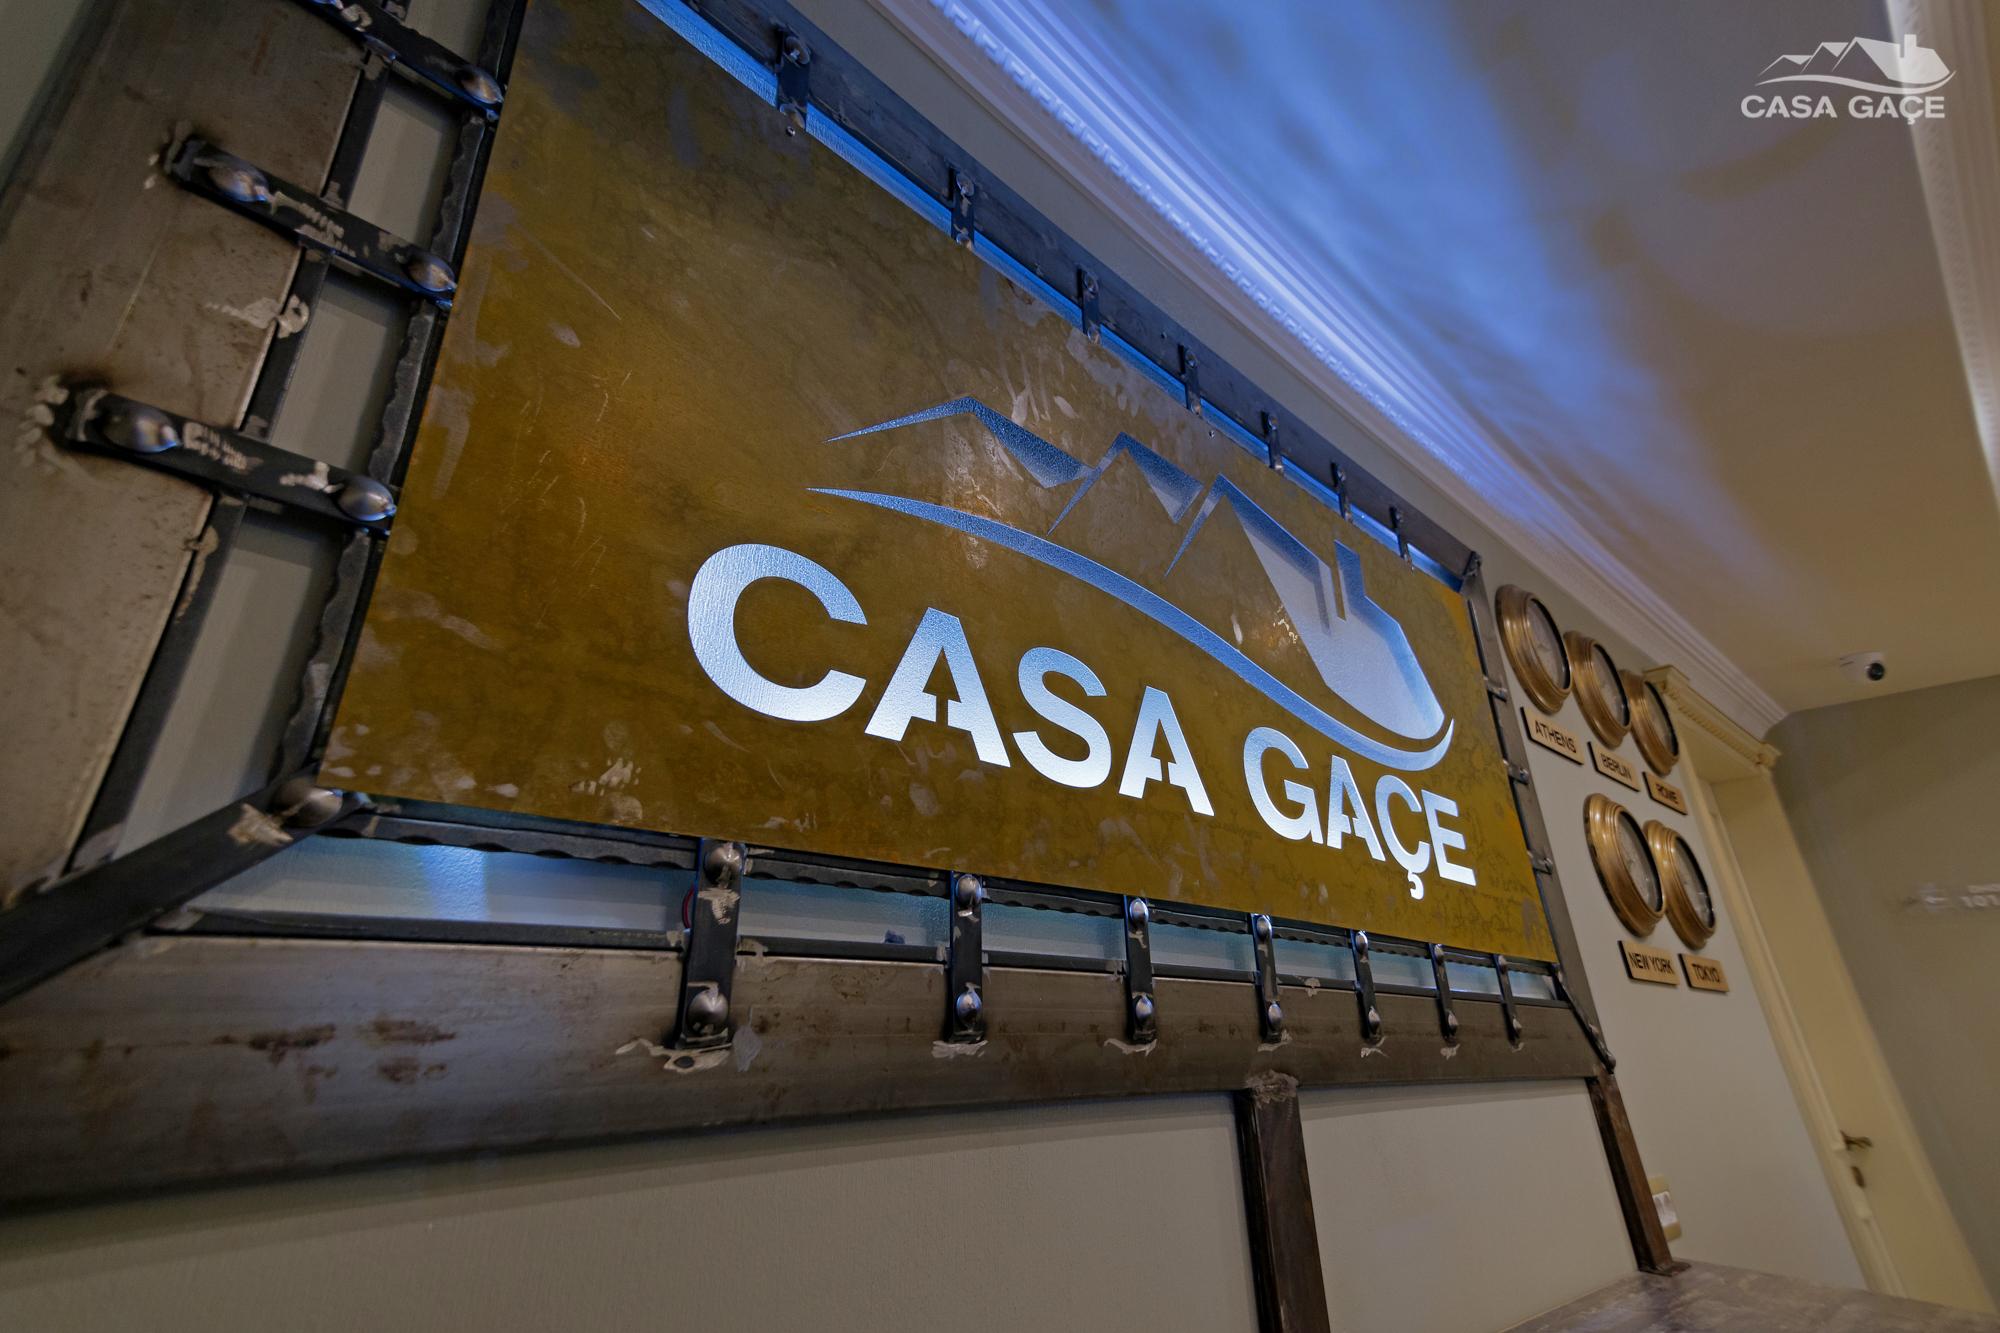 Casa Gace - serenata korcare